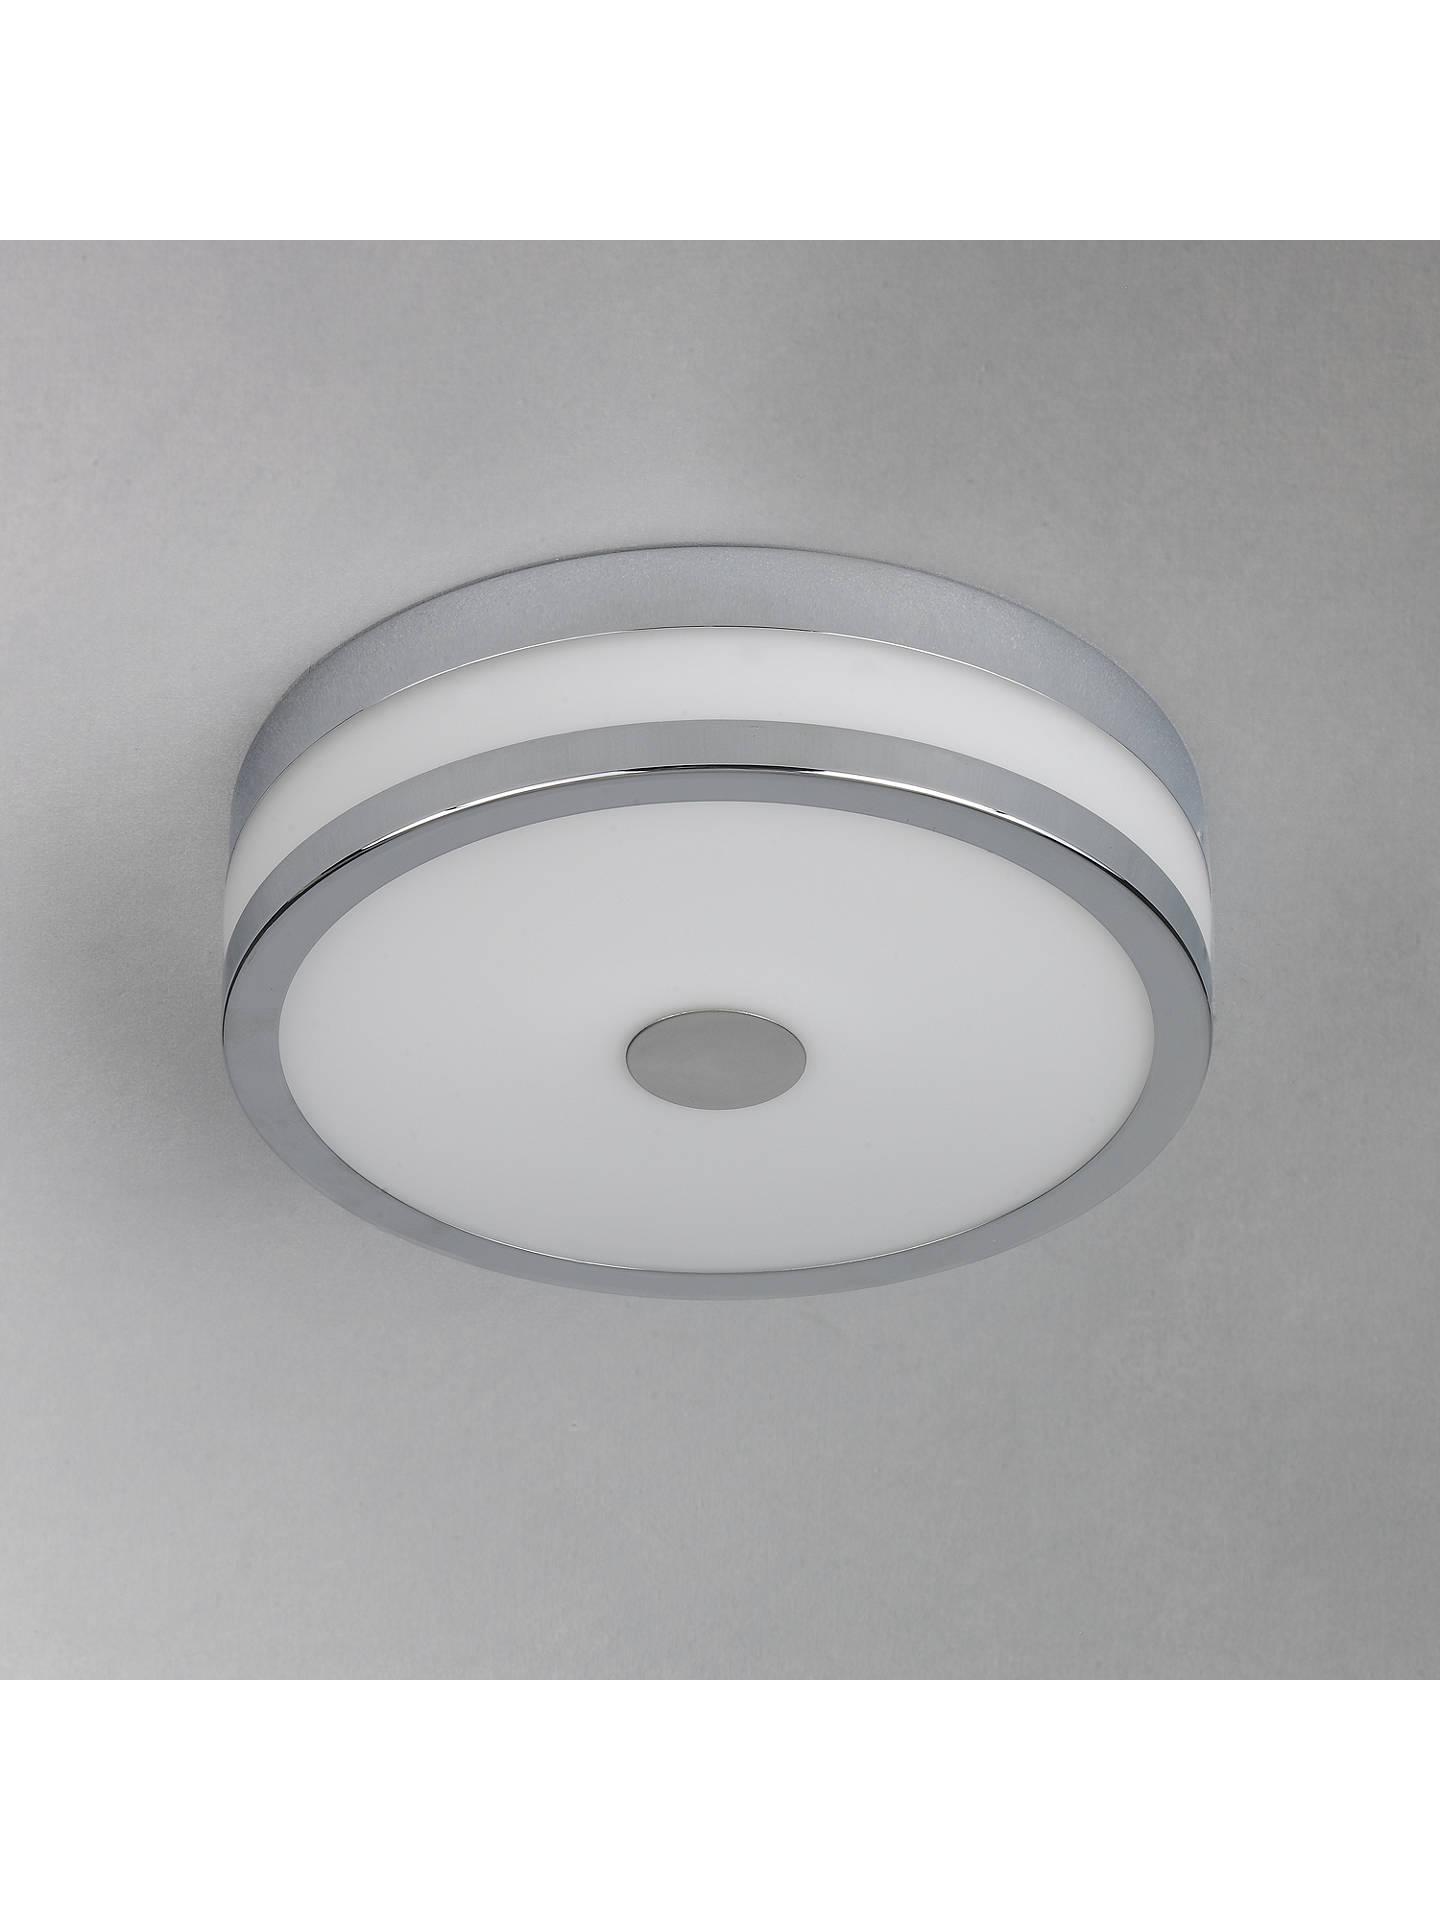 buyjohn lewis partners shiko bathroom ceiling light online at johnlewis - Bathroom Ceiling Light Fixtures